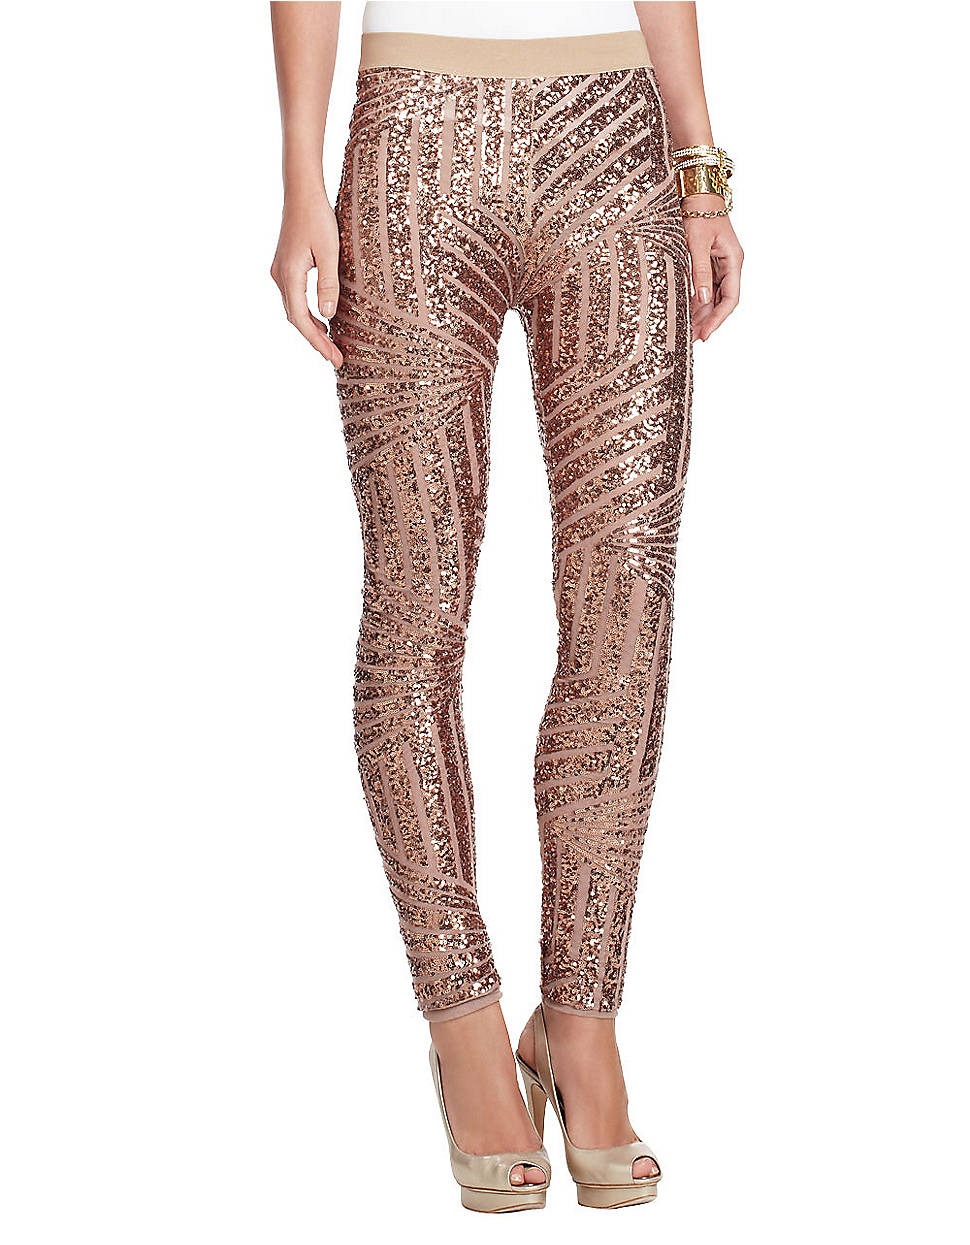 Gap Womens Jeans